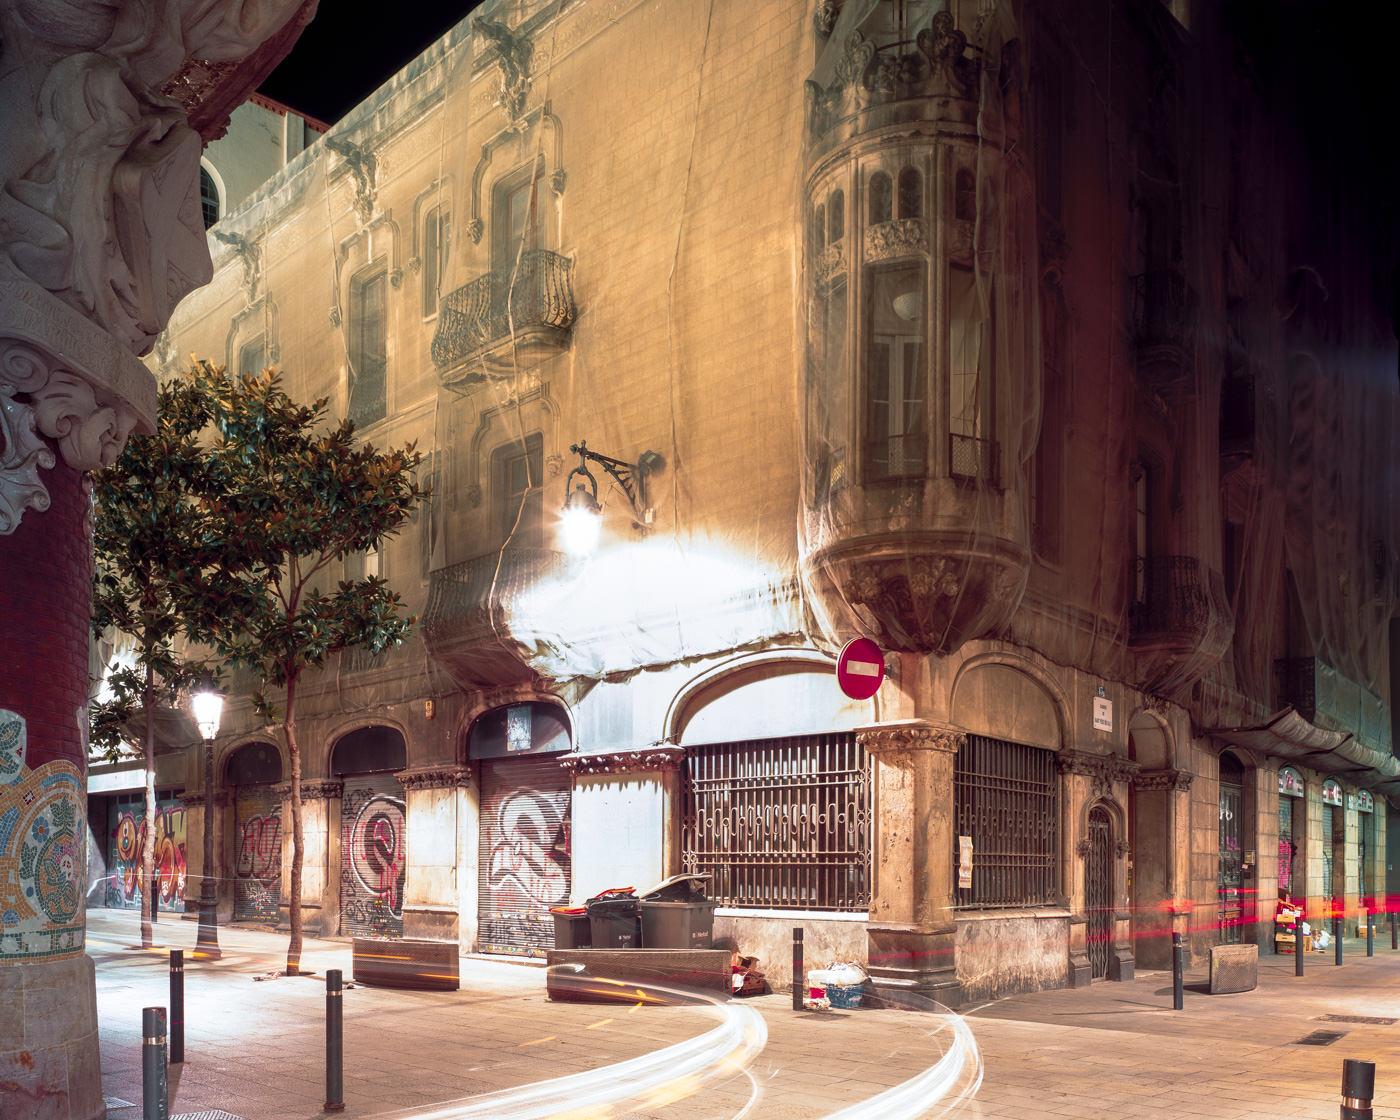 """Colegio La Salle, Sant Pere més Alt, Barcelona"" from the series Nylon Chrysalis, by William Mokrynski"